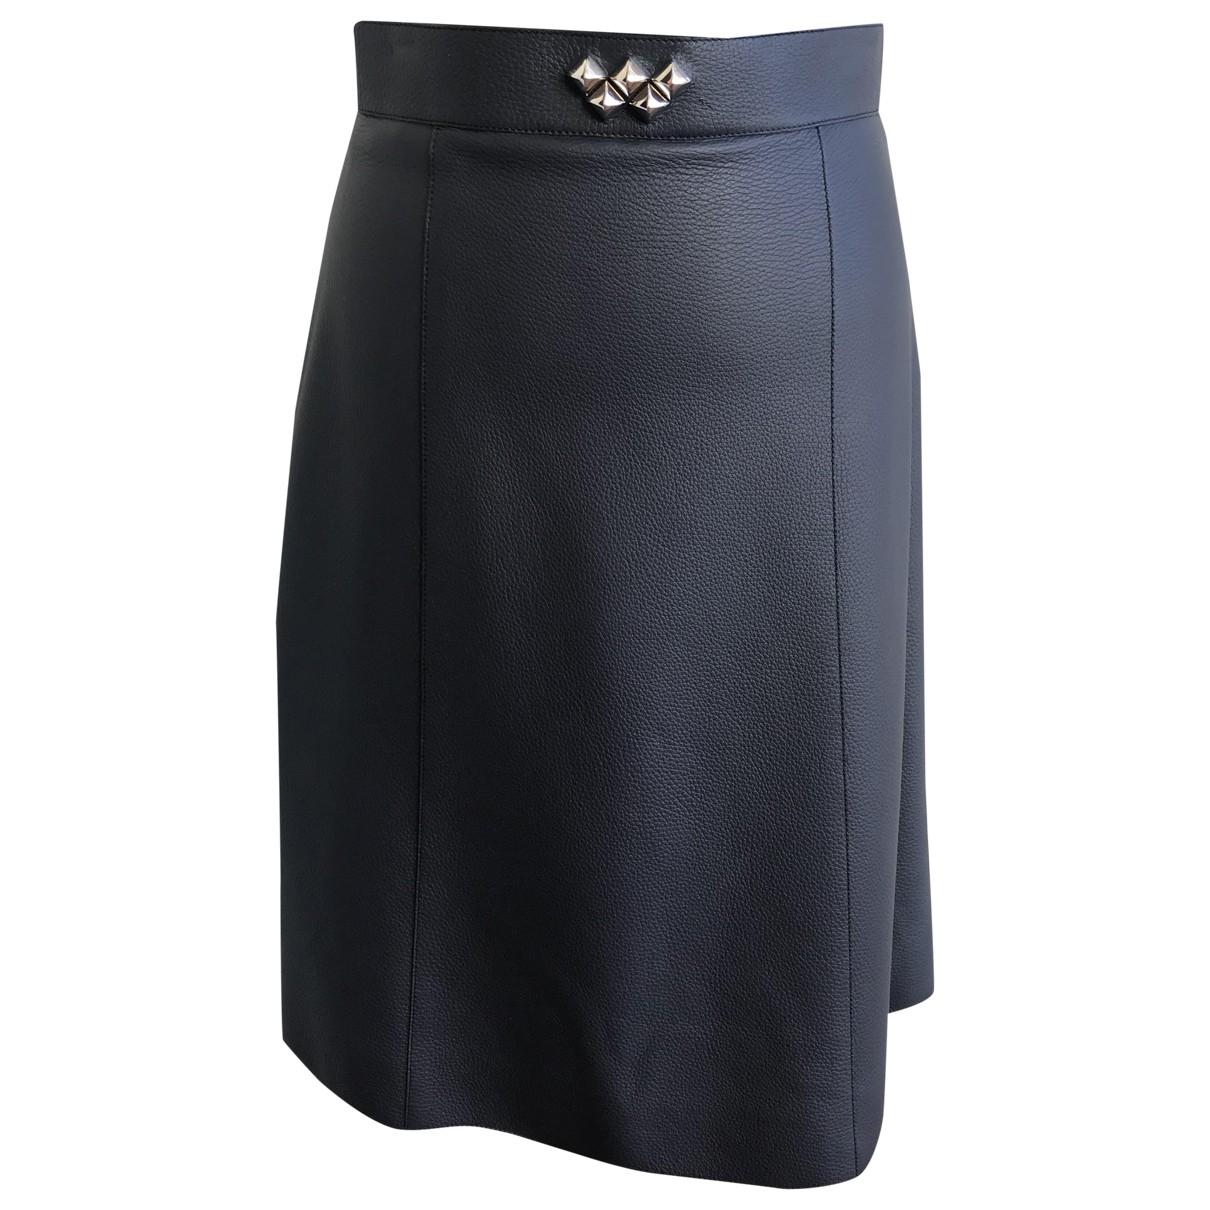 Hermès \N Grey Leather skirt for Women 38 FR